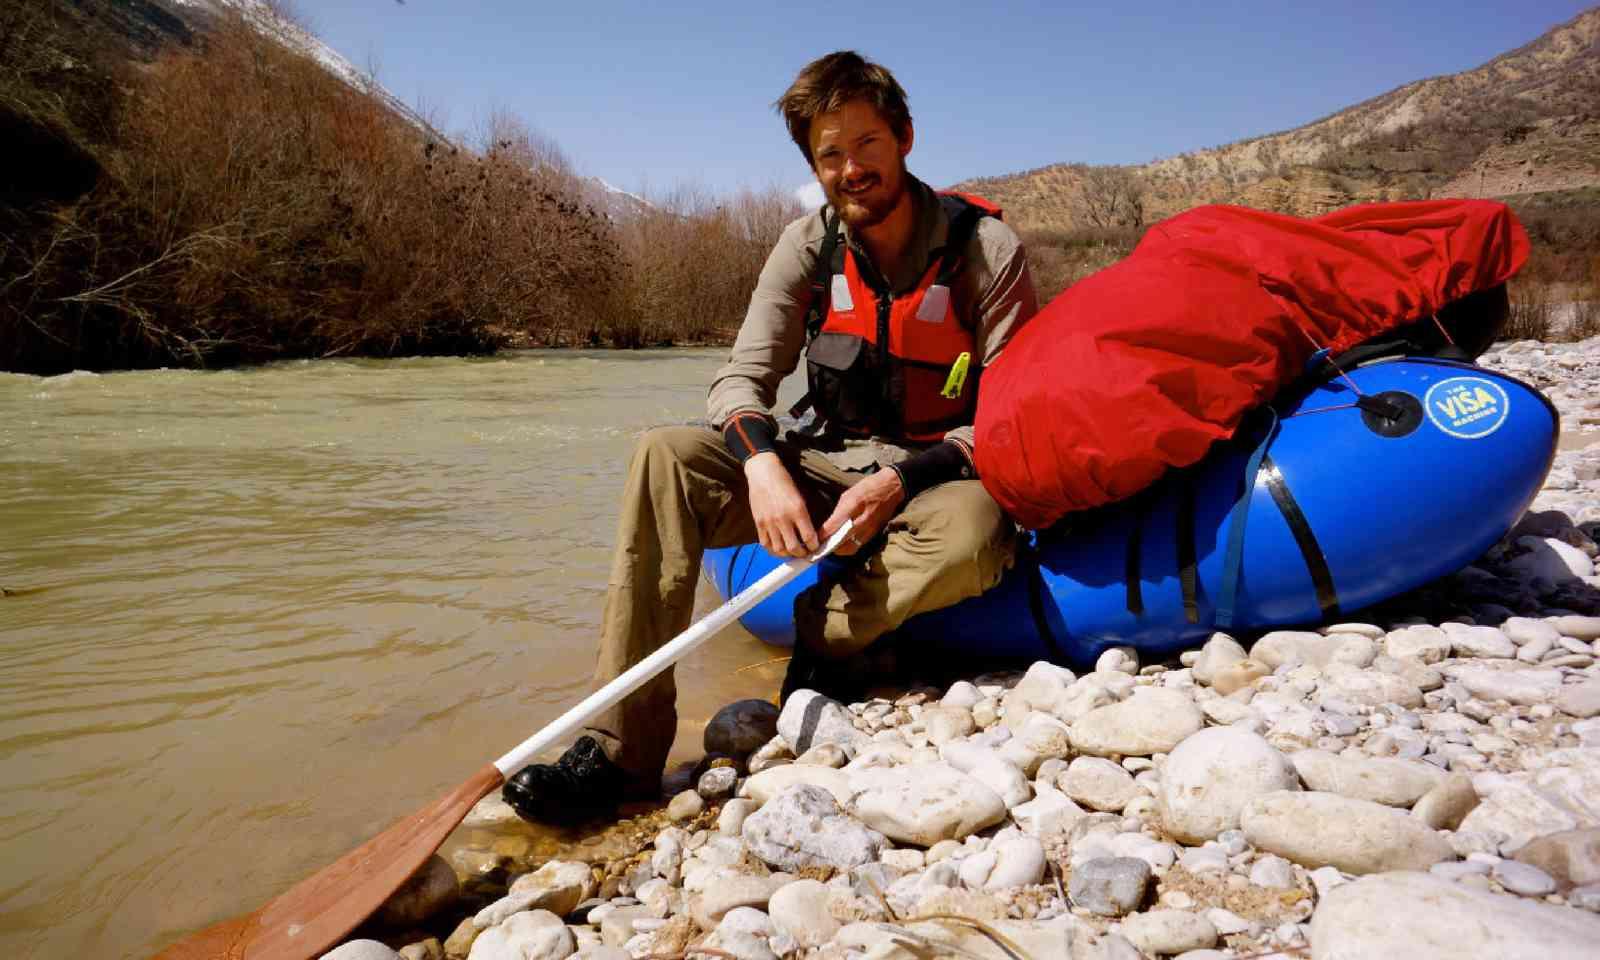 Leon preparing to set off in his inflatable kayak